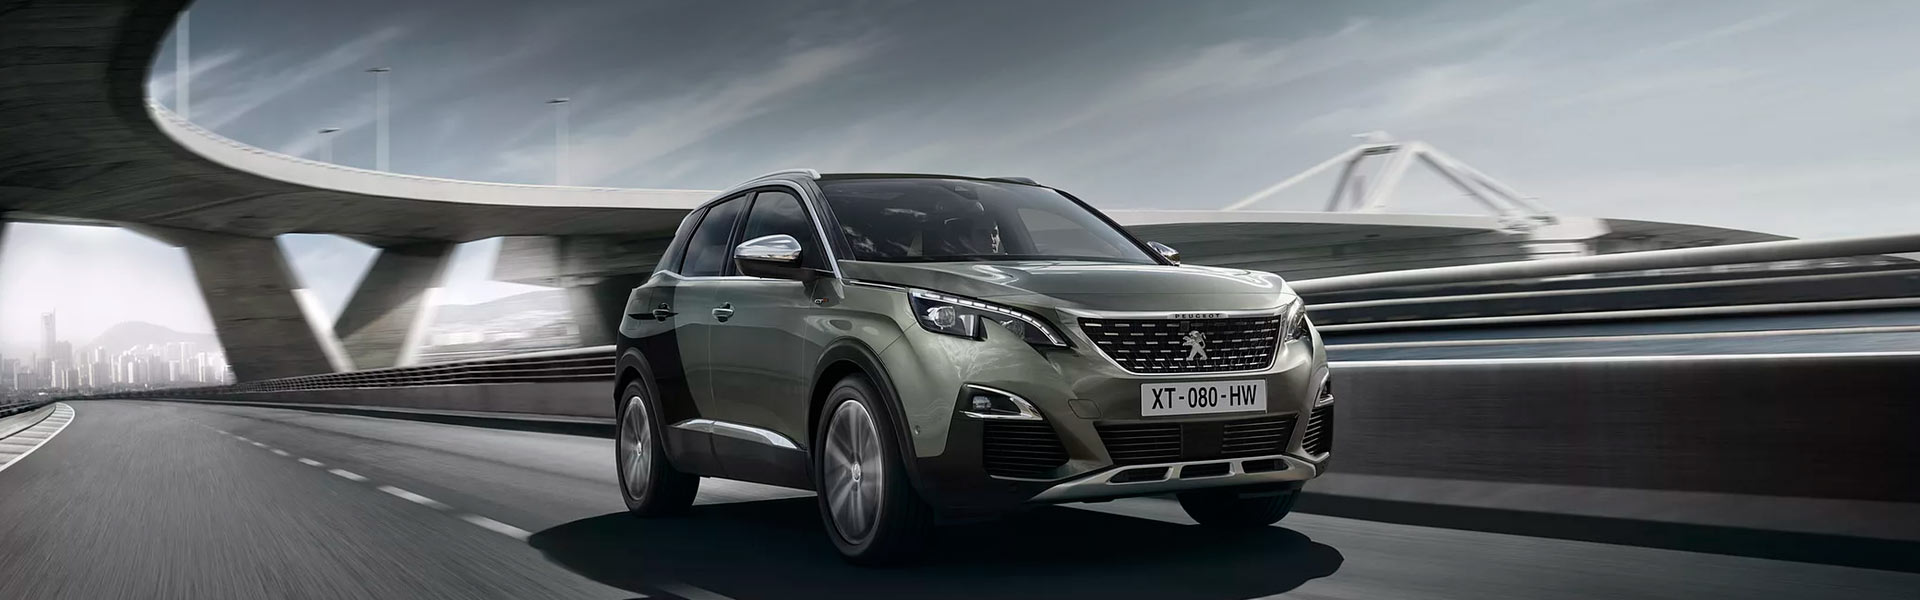 Замена ГРМ Peugeot